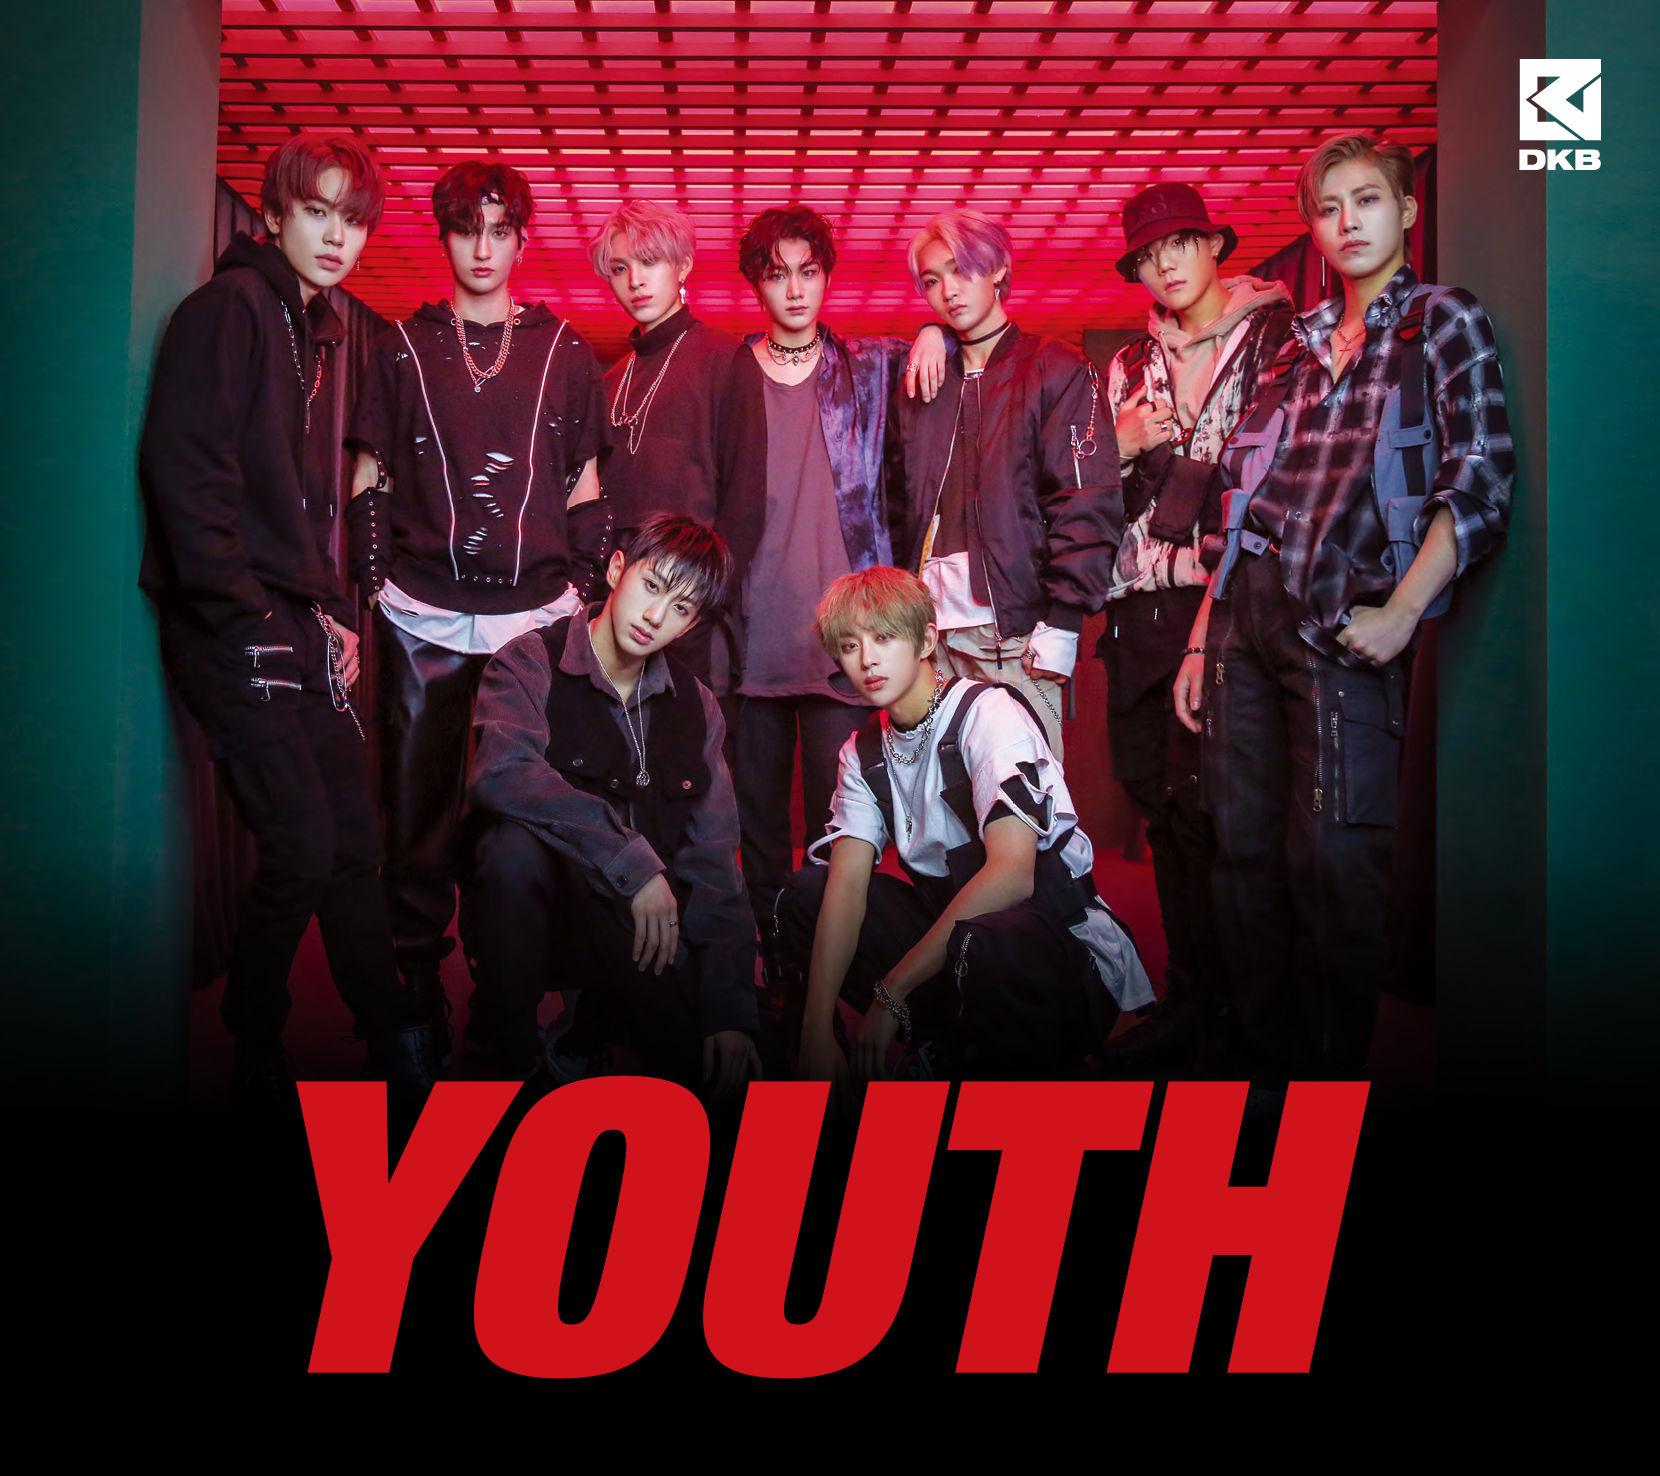 Youth (DKB Japanese album)